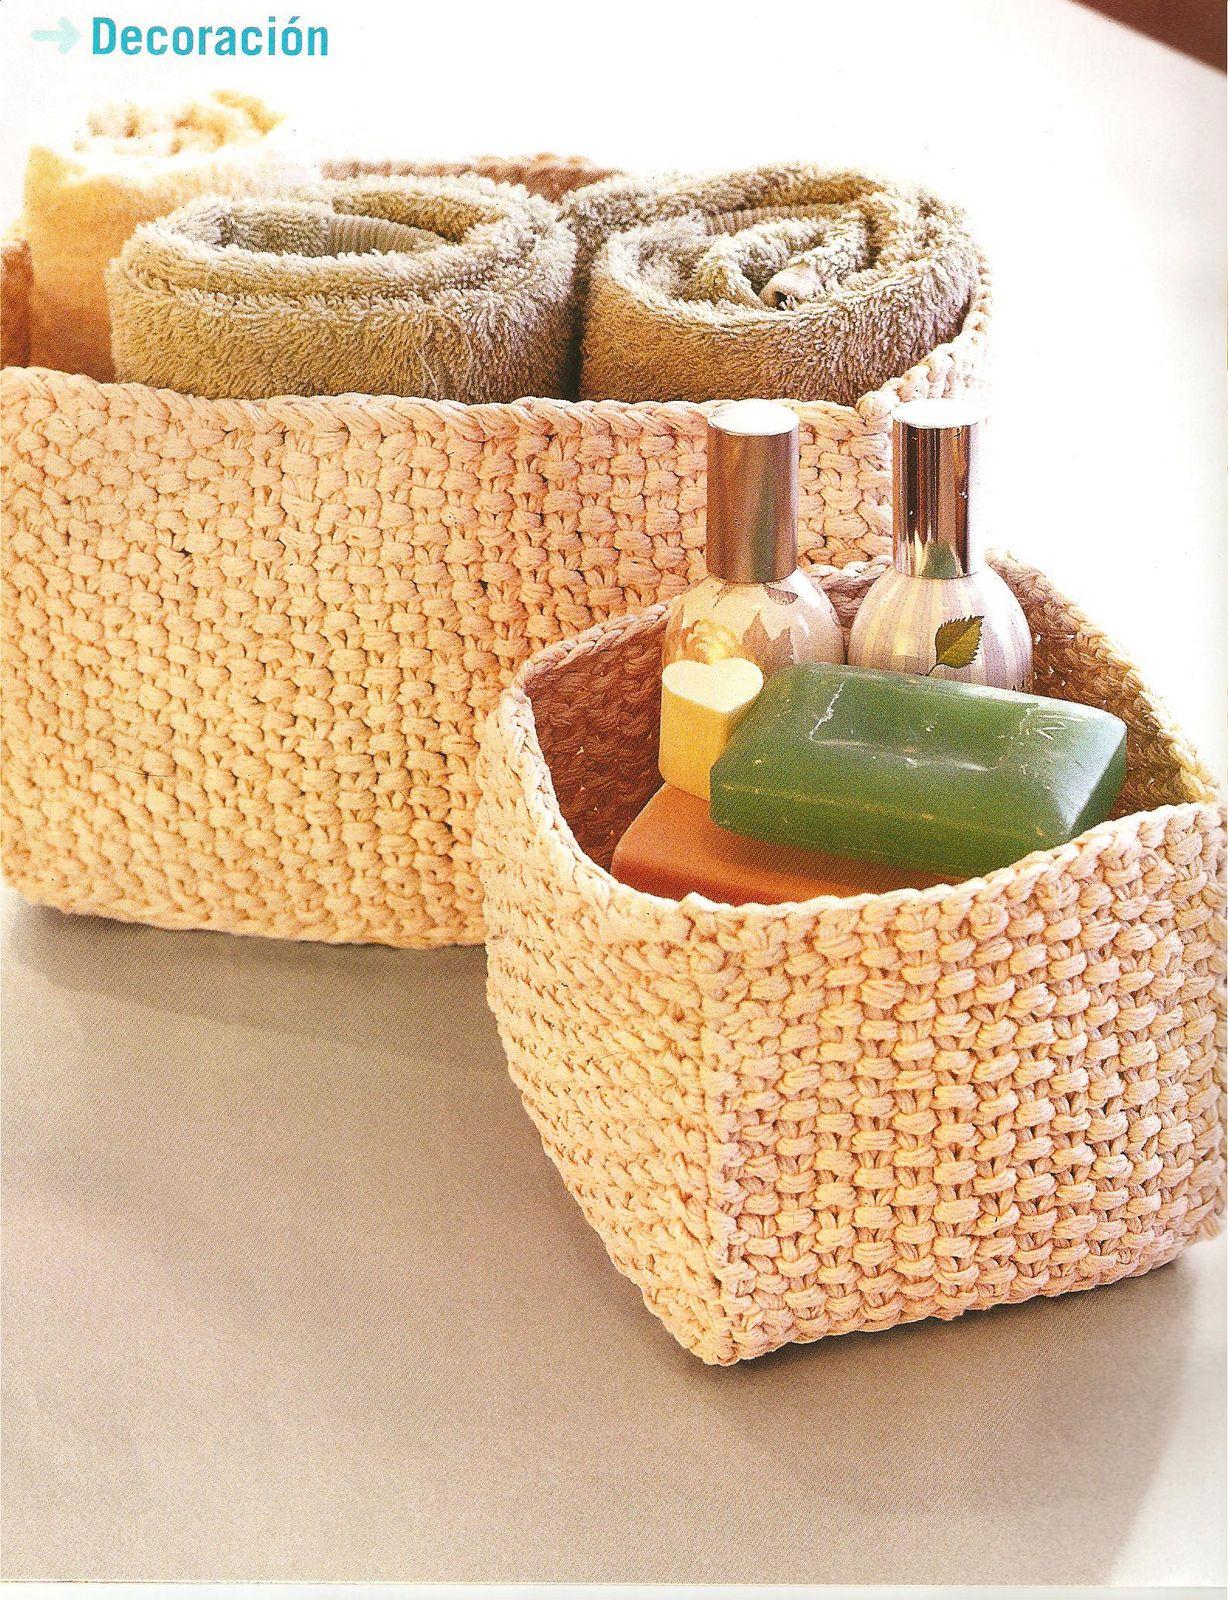 Ba l manualidades accesorios tejidos para decorar en casa for Accesorios para decorar la casa